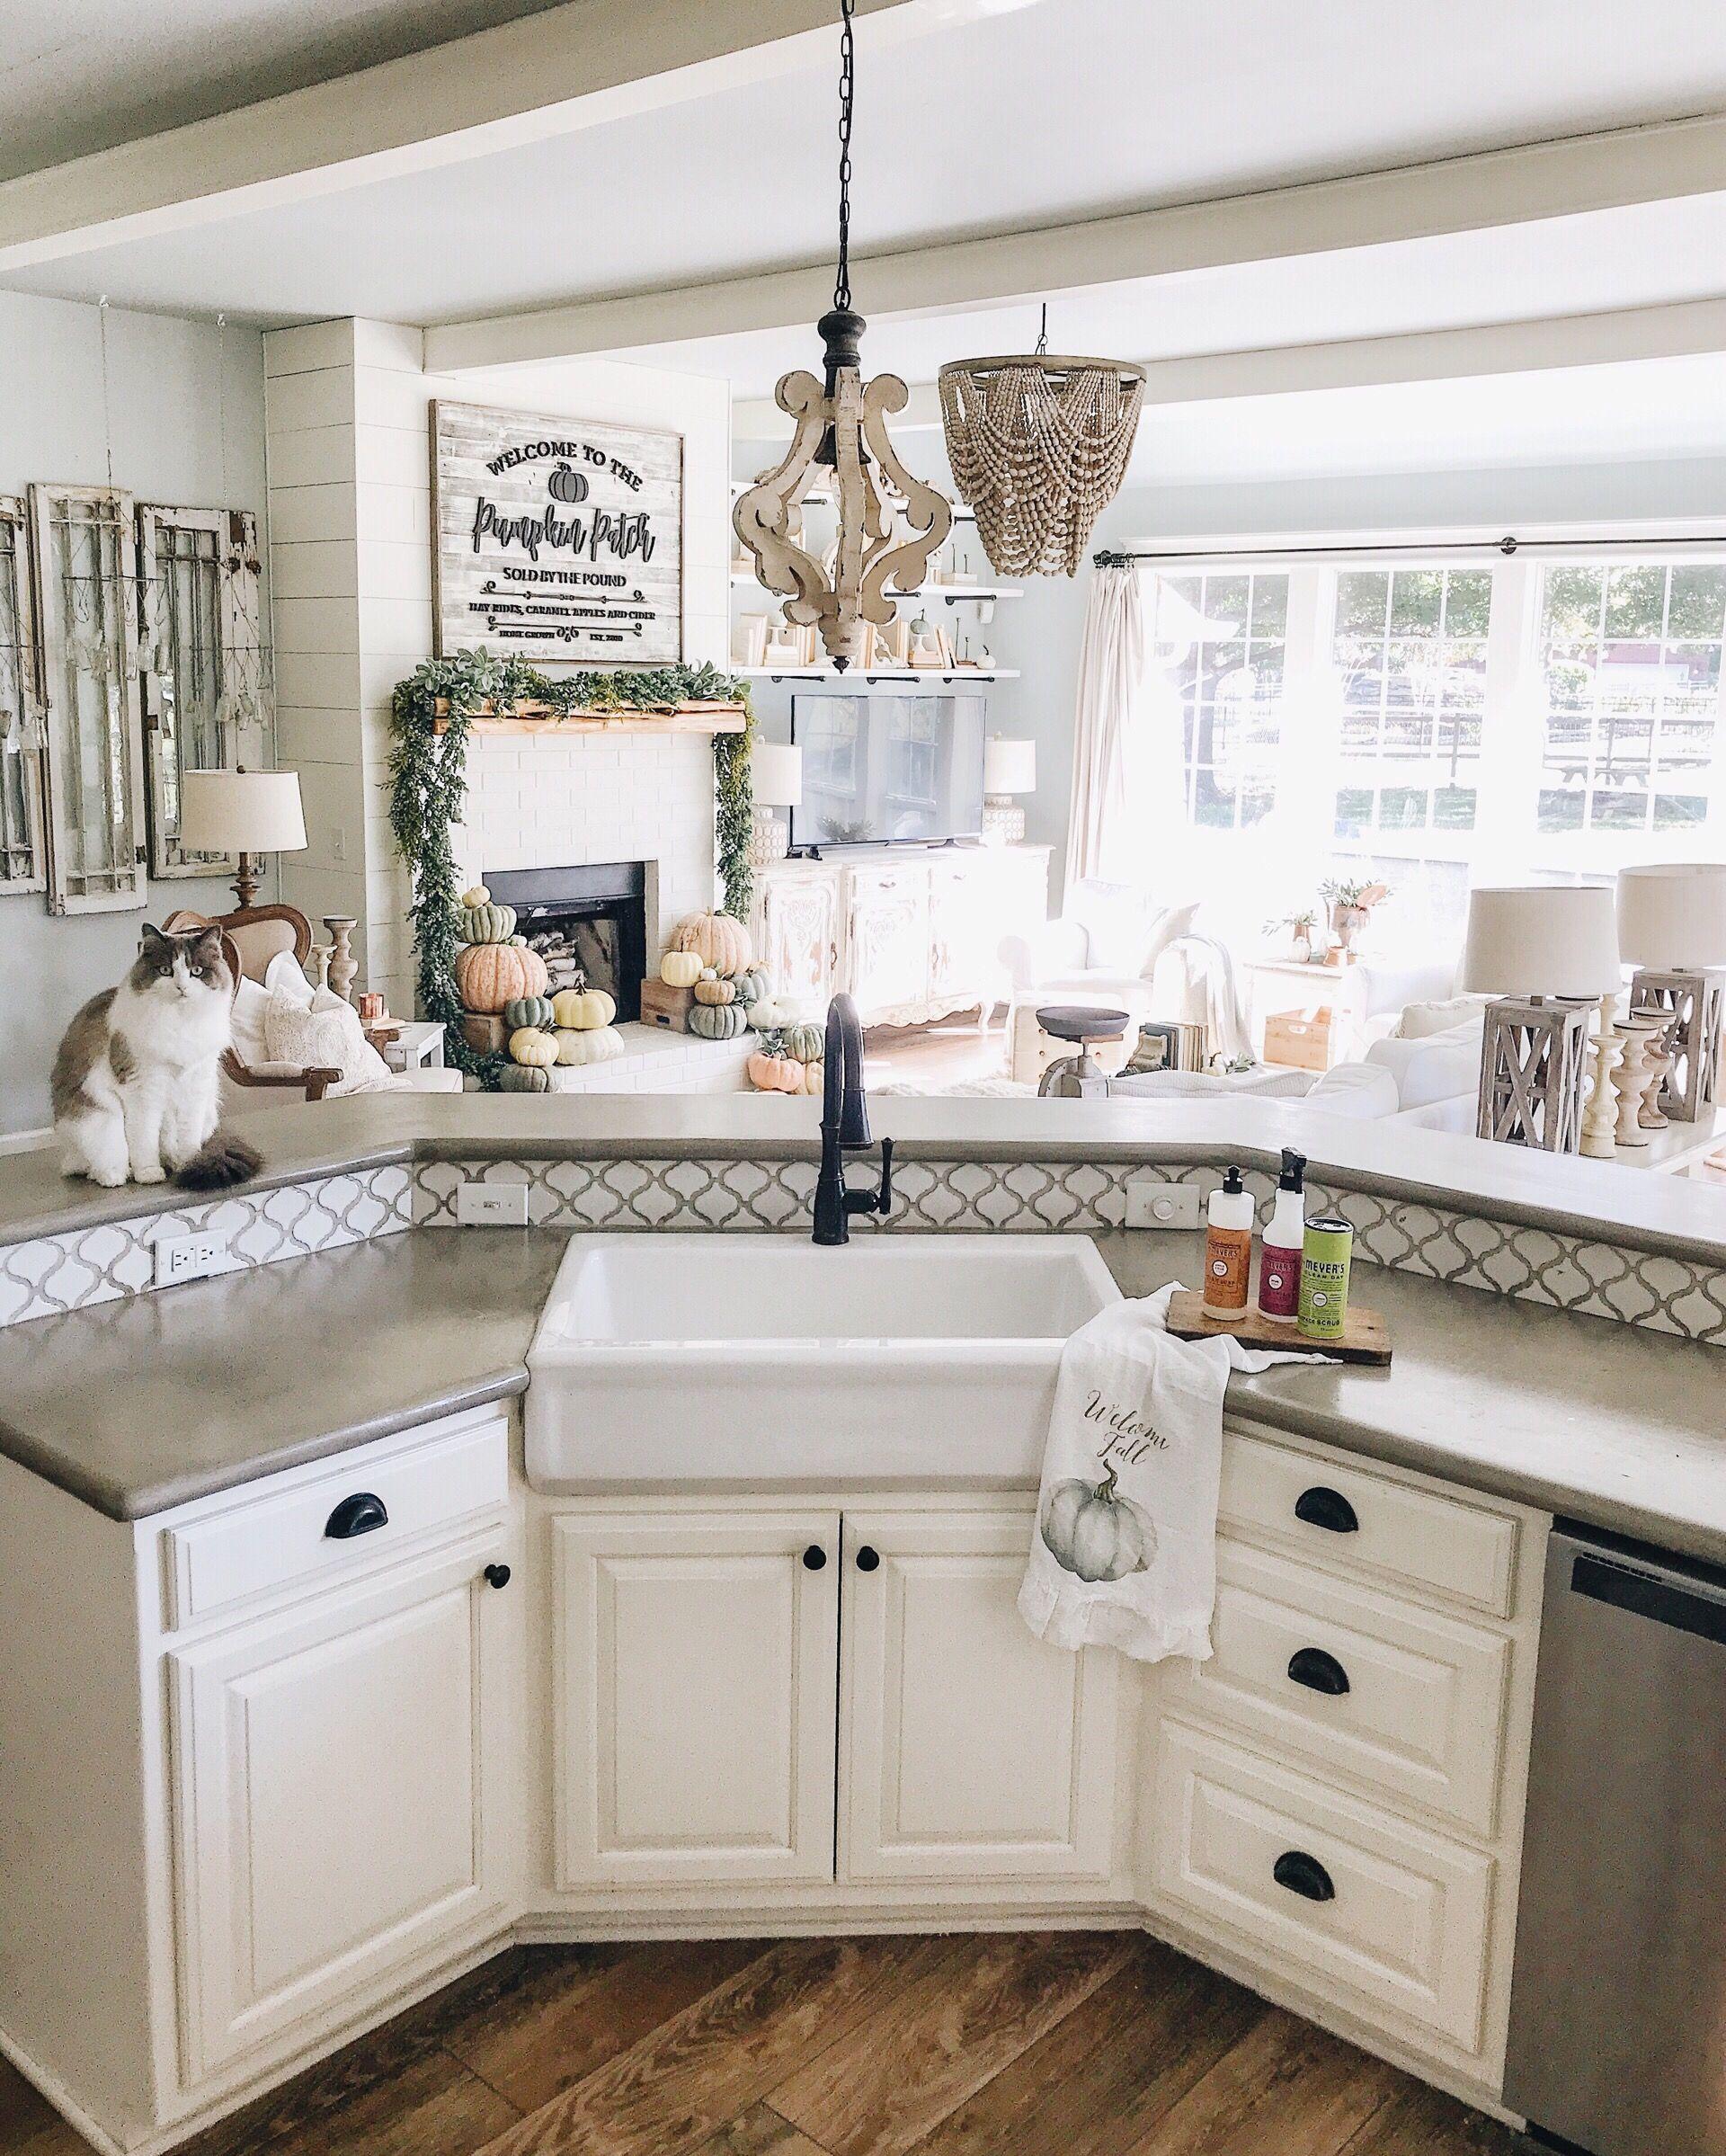 Cottonstem.com Cottage Farmhouse Kitchen Sink And Living